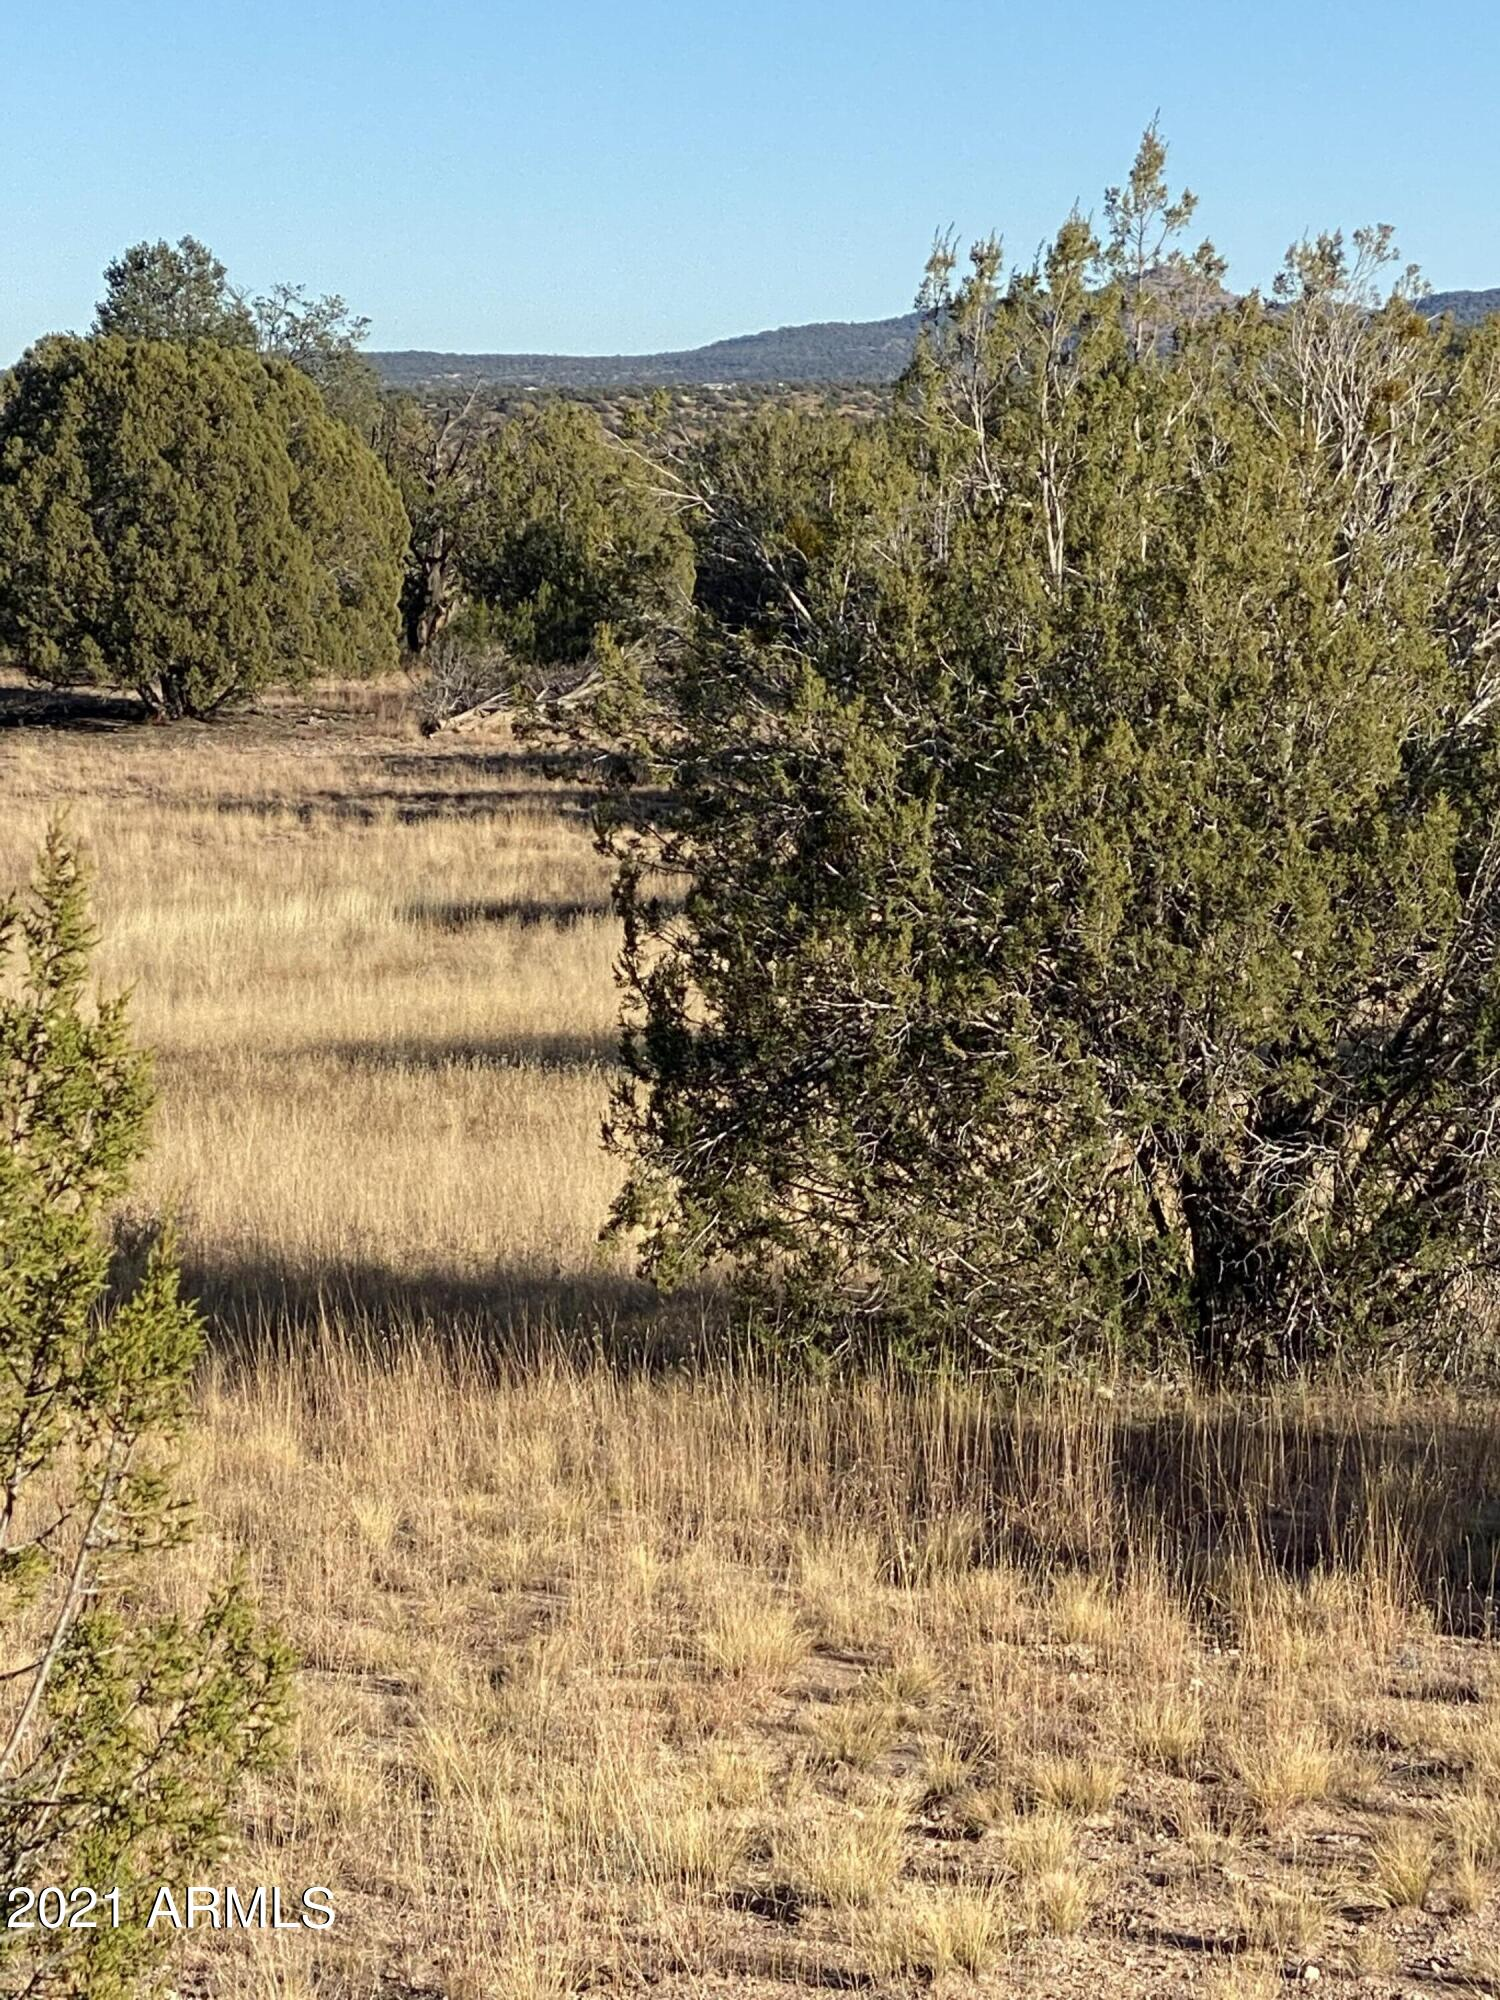 0 N Gecko Wash Drive # 118, Seligman, AZ 86337, ,Land,For Sale,0 N Gecko Wash Drive # 118,6312778